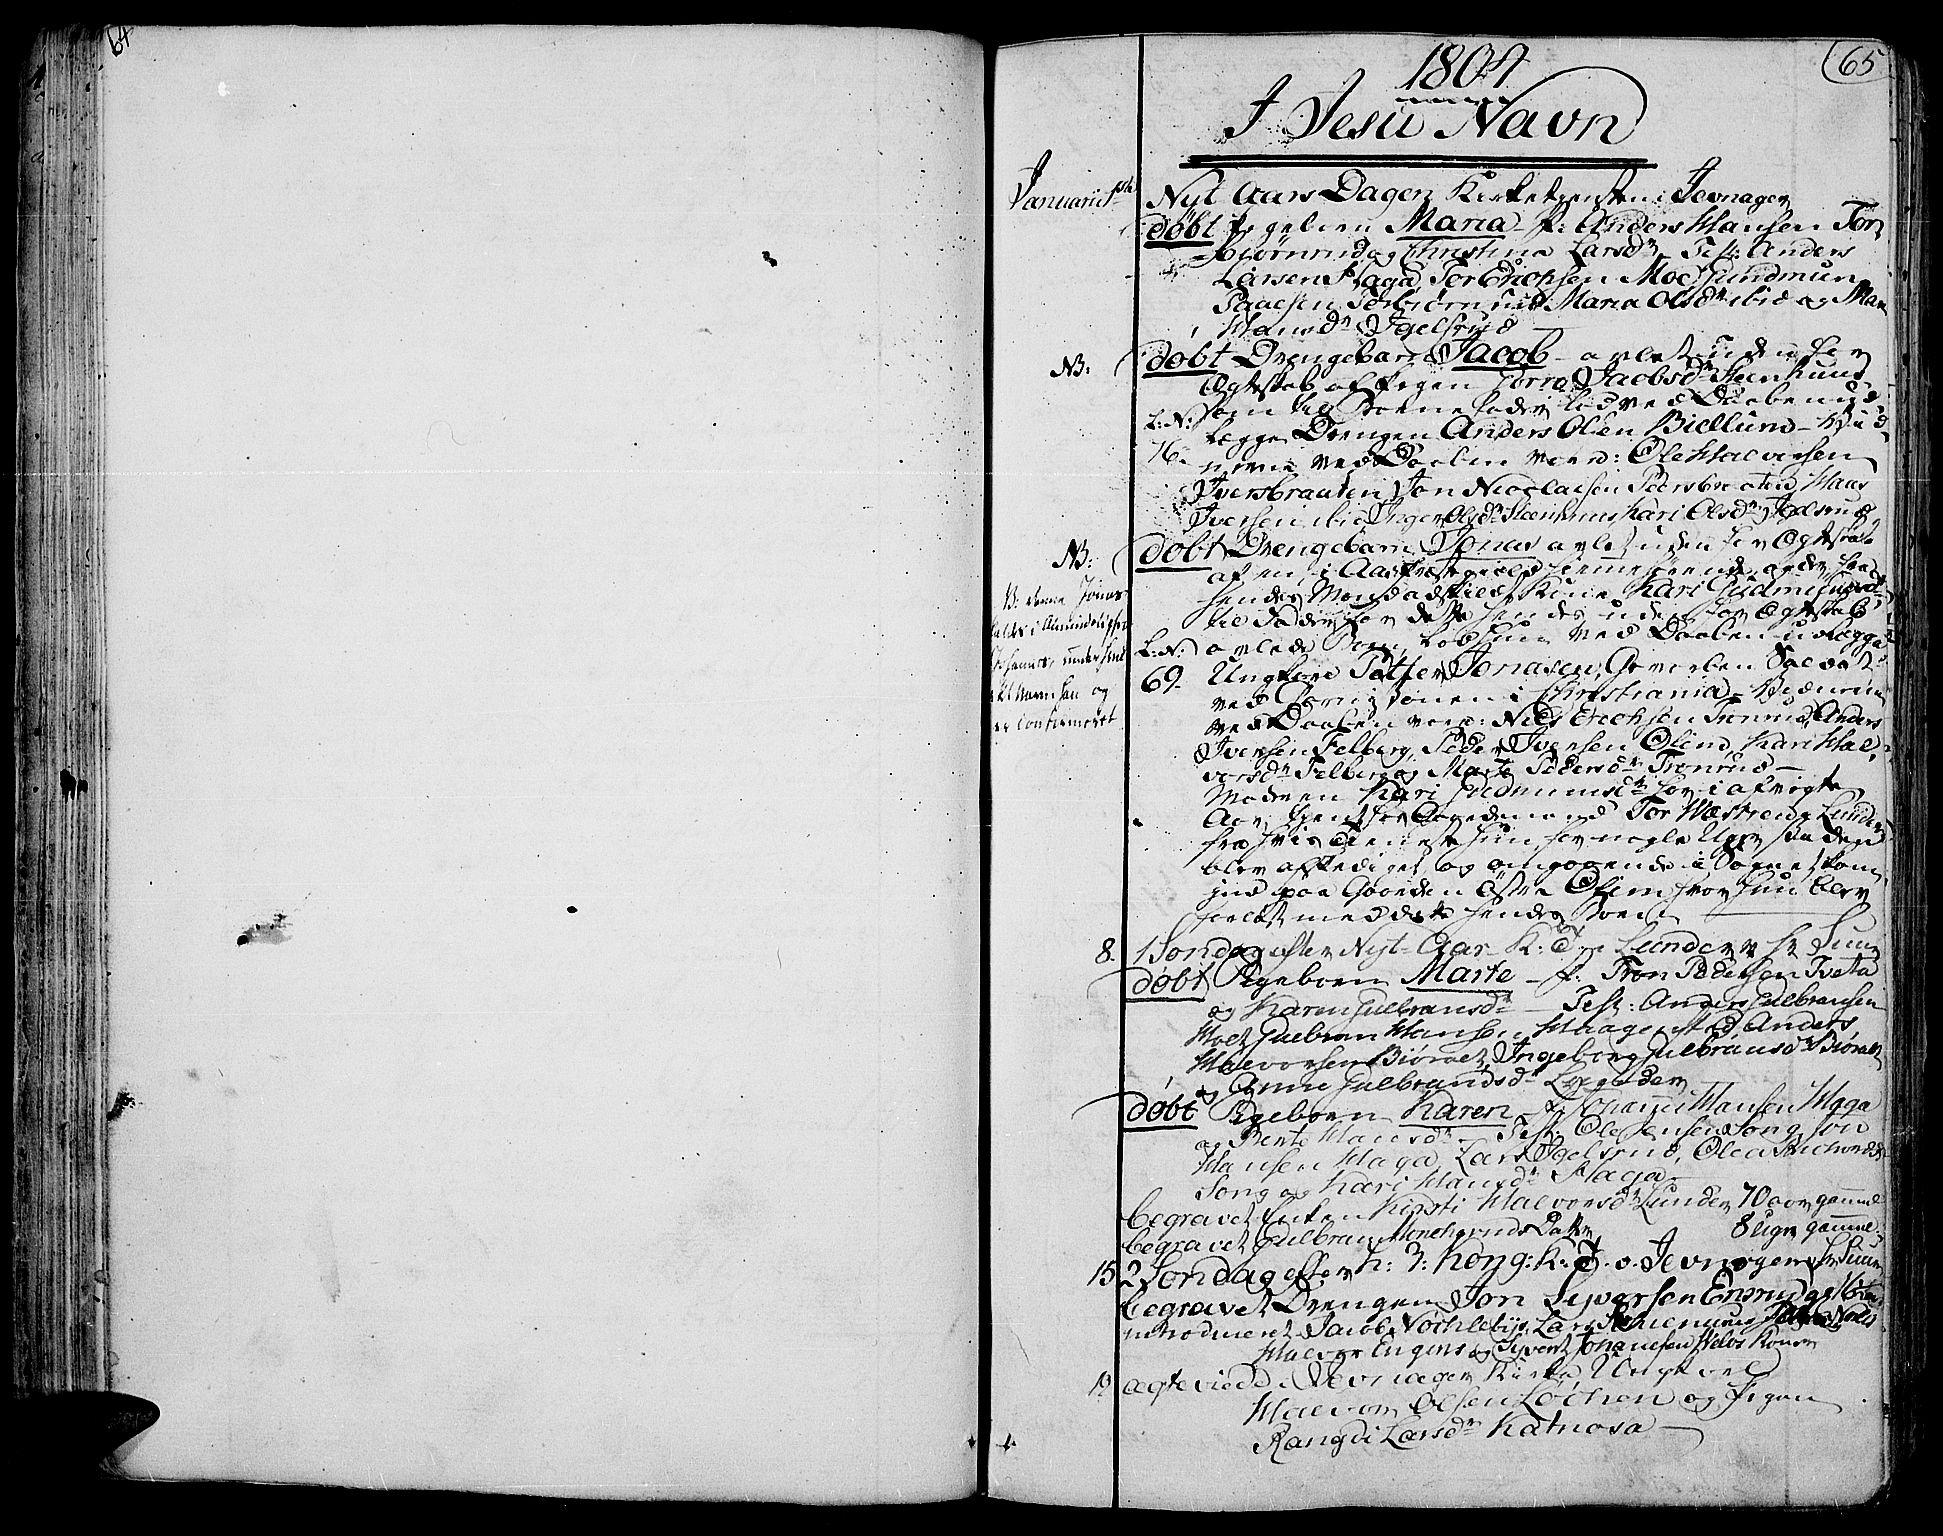 SAH, Jevnaker prestekontor, Ministerialbok nr. 4, 1800-1861, s. 64-65